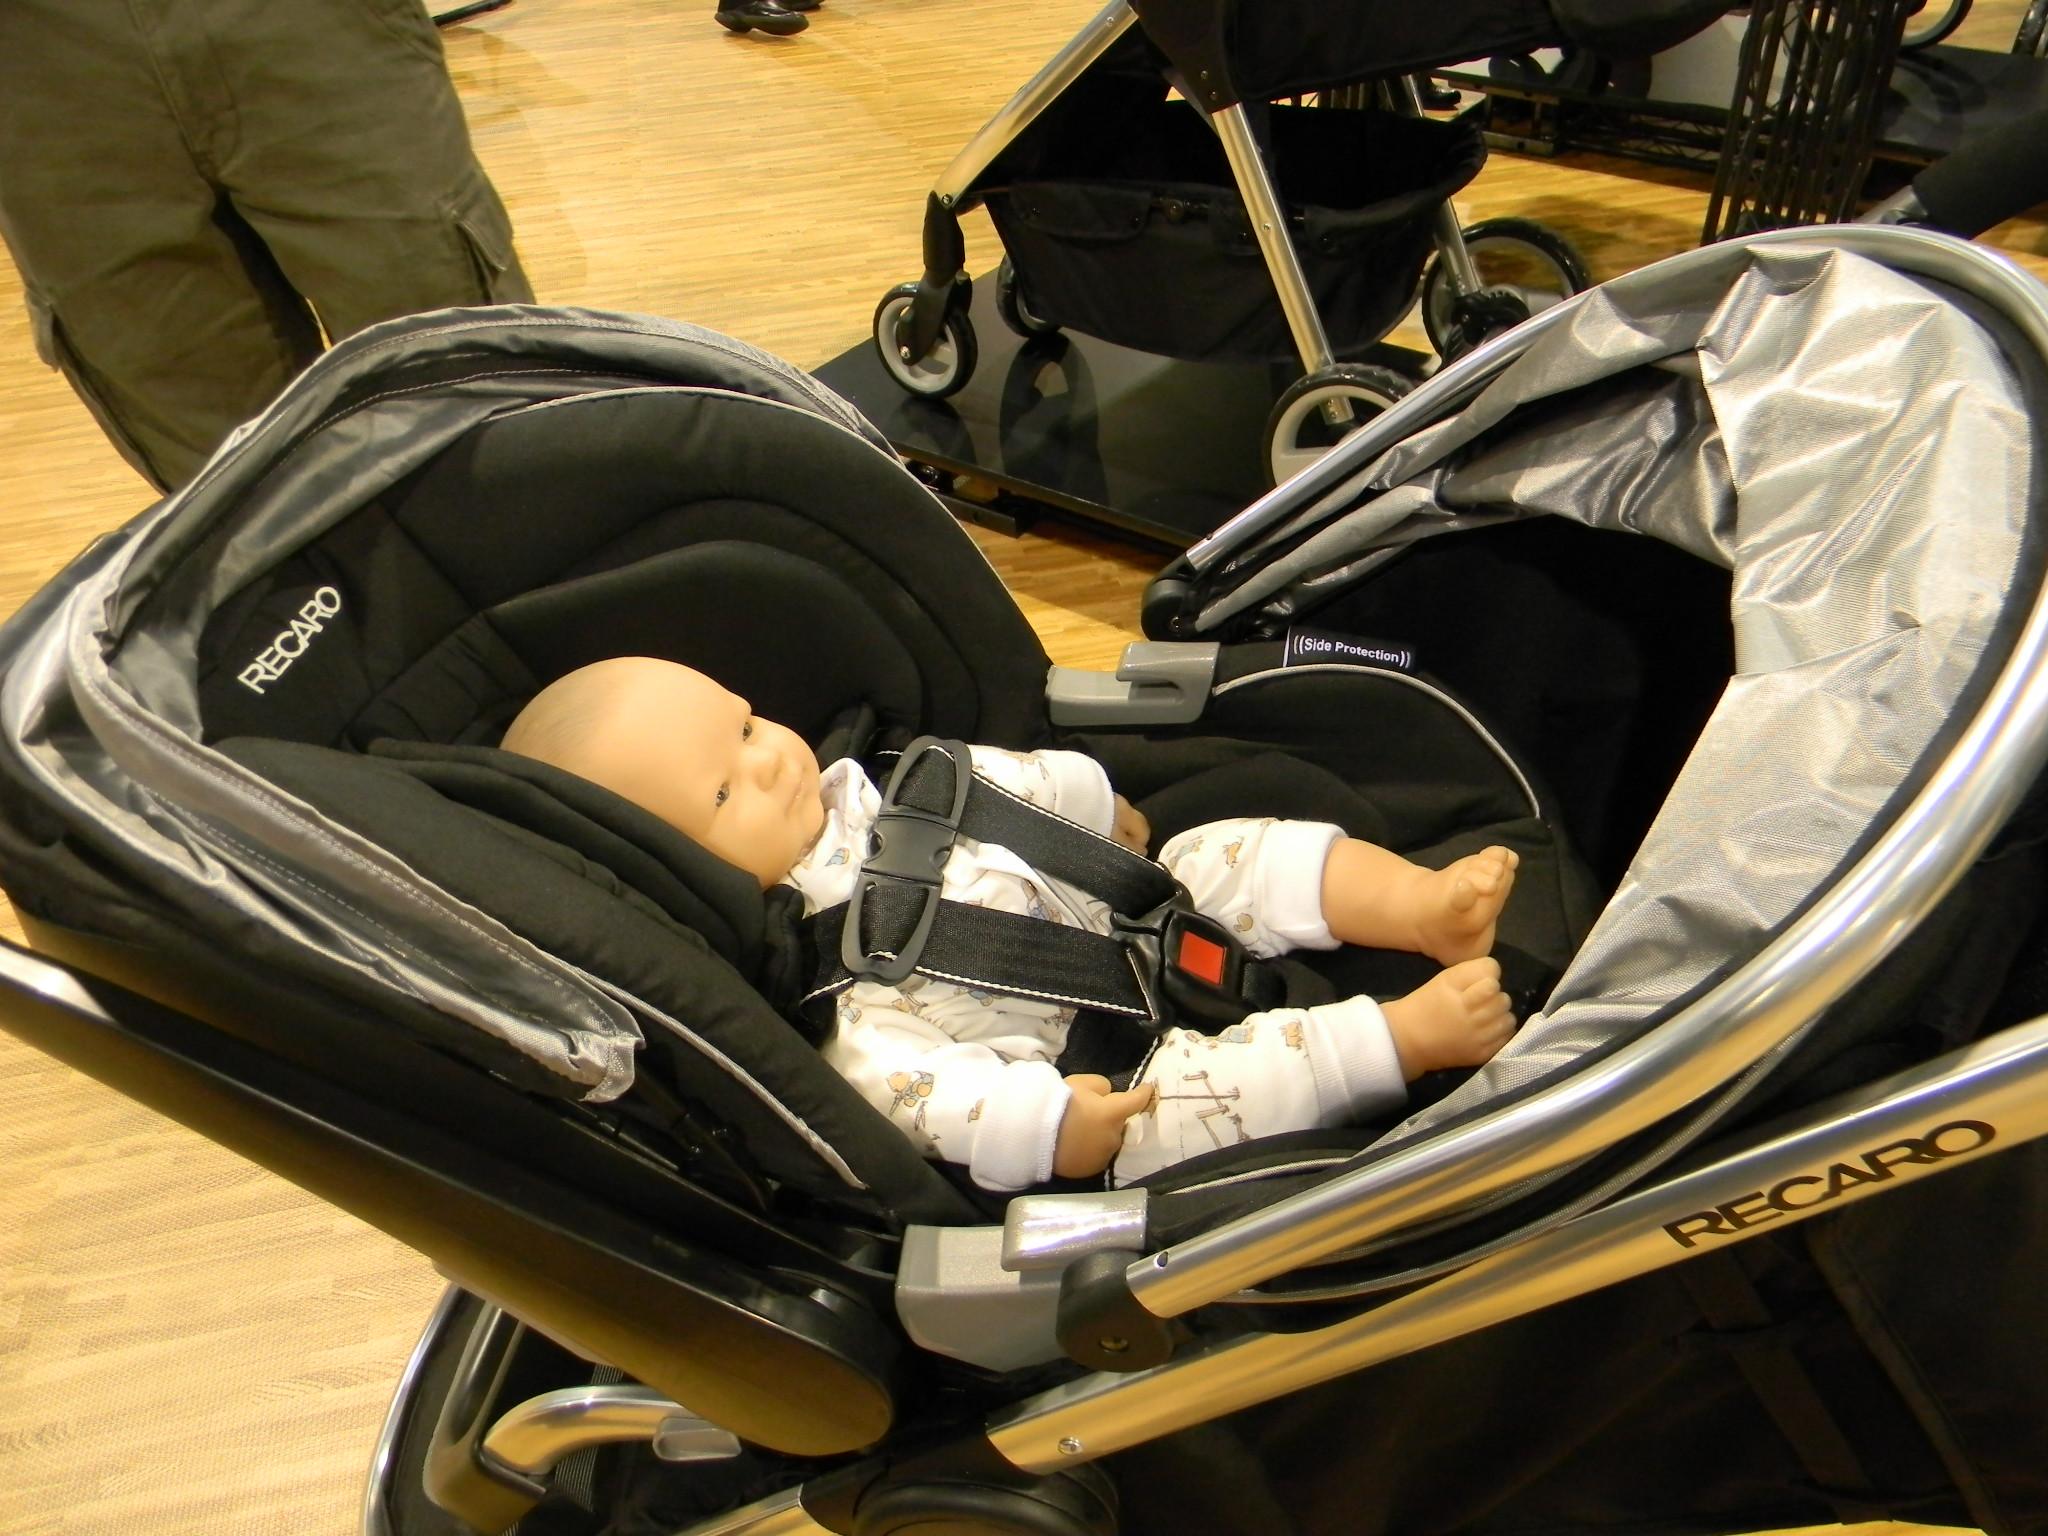 Recaro Guardia Infant Seat Urbanlife Stroller